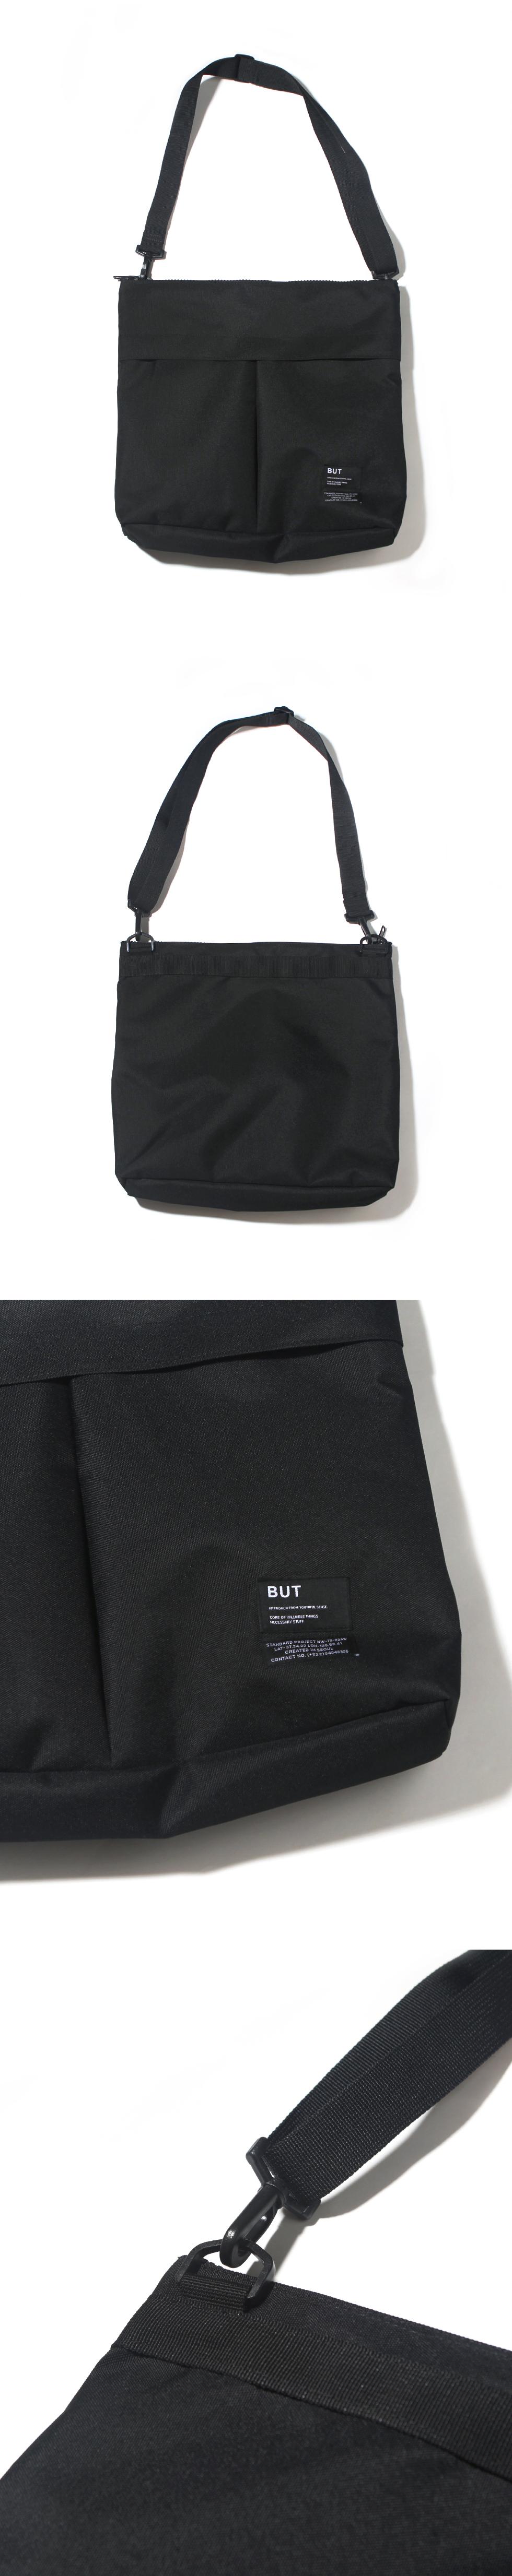 2PK TEXTBOOK BAG-BLACK